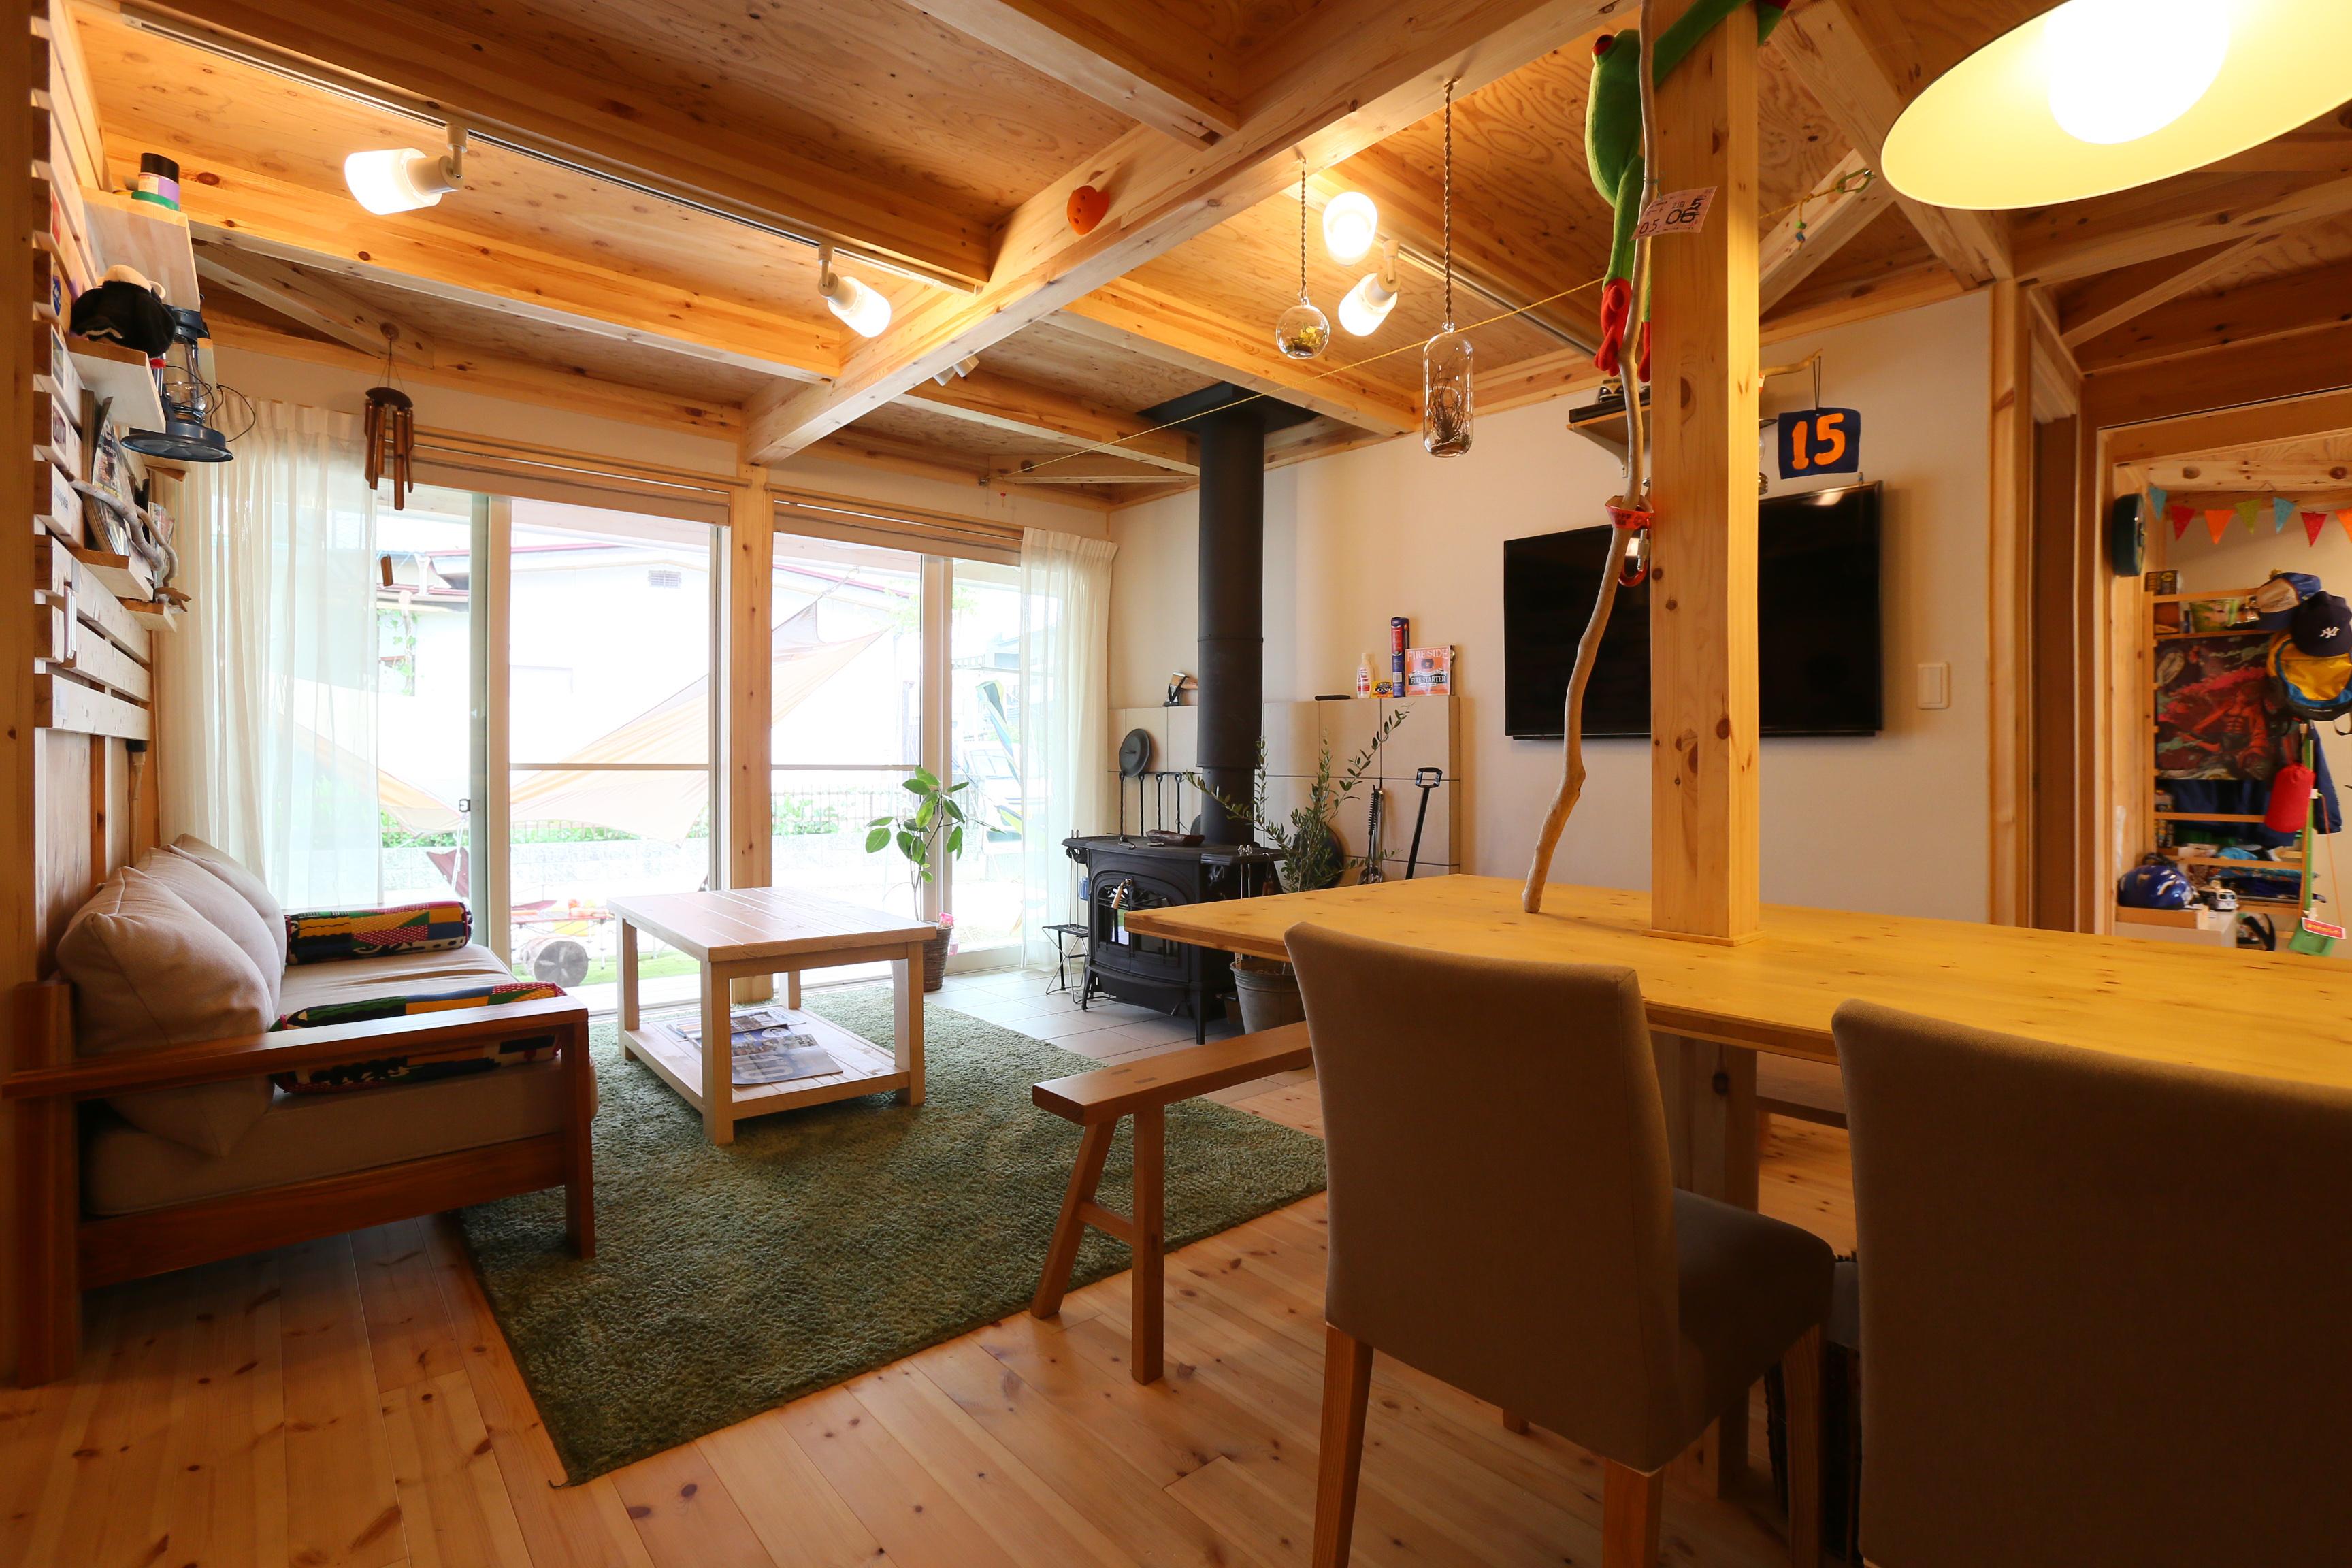 BinO志太・榛原 マルジン総建【子育て、自然素材、平屋】窓を開ければすぐにウッドデッキに。家と庭に一体感を与えてくれえる